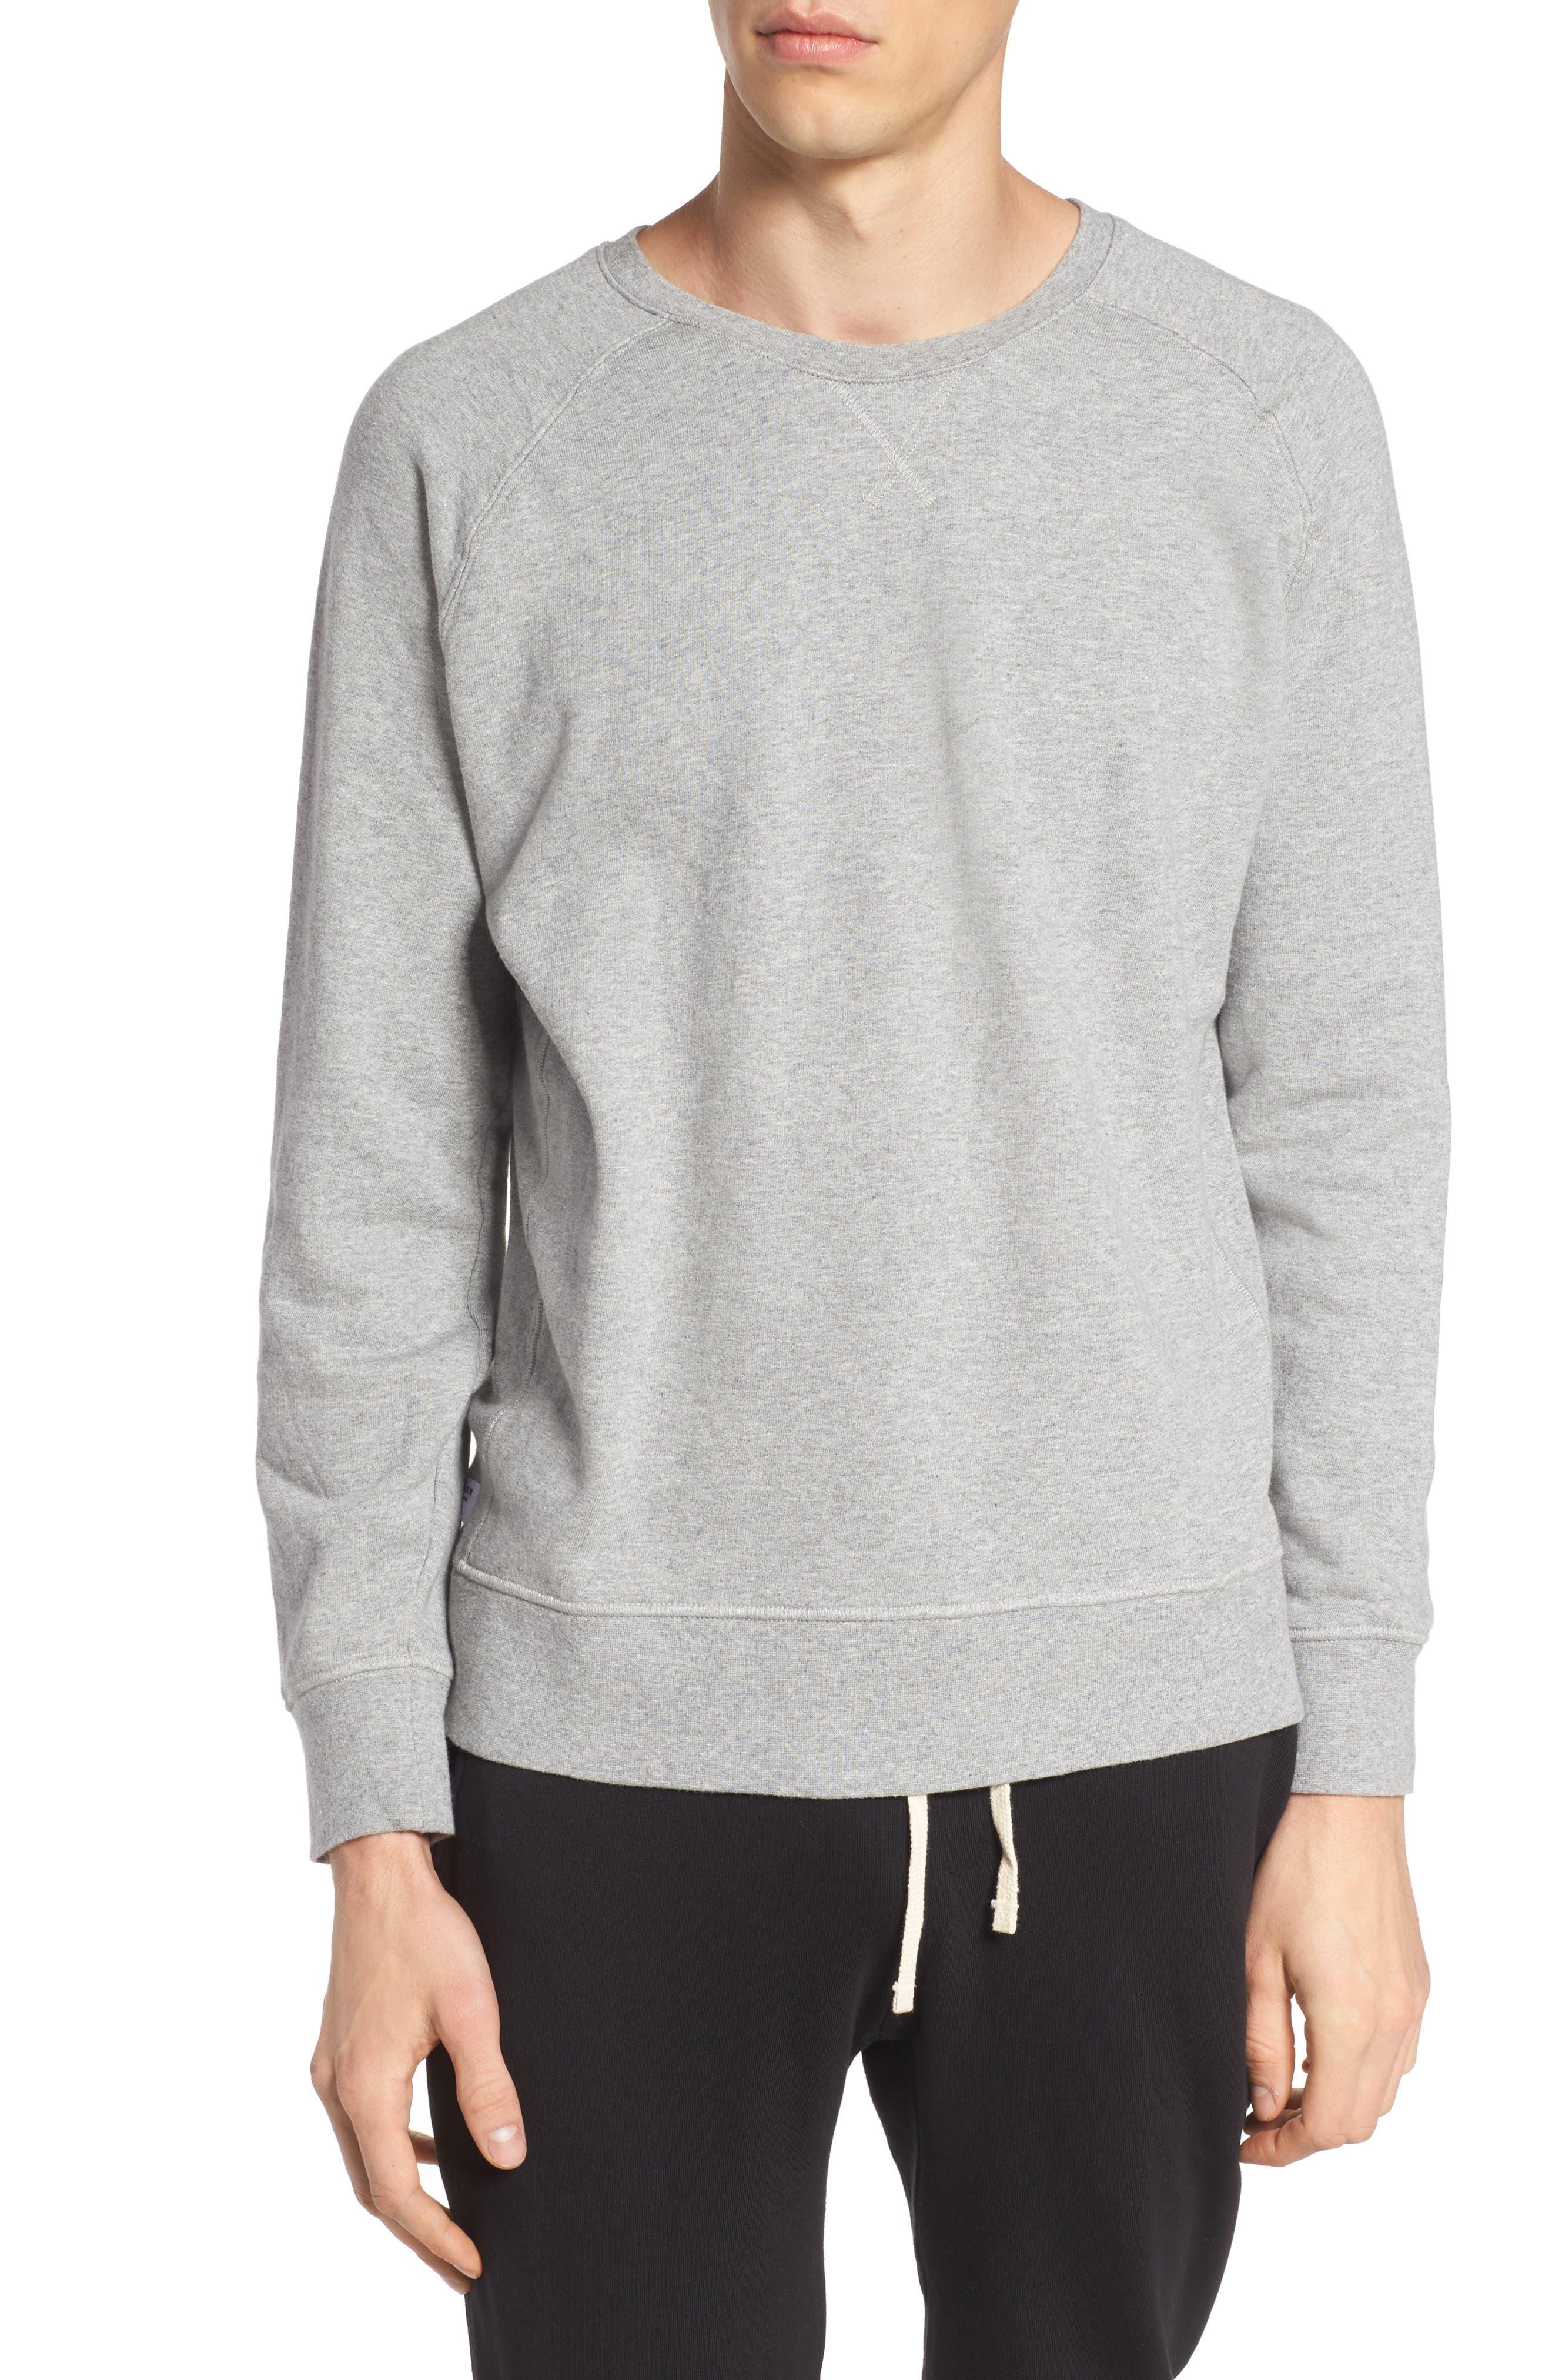 Lounge Crewneck Sweatshirt,                         Main,                         color, Heather Grey